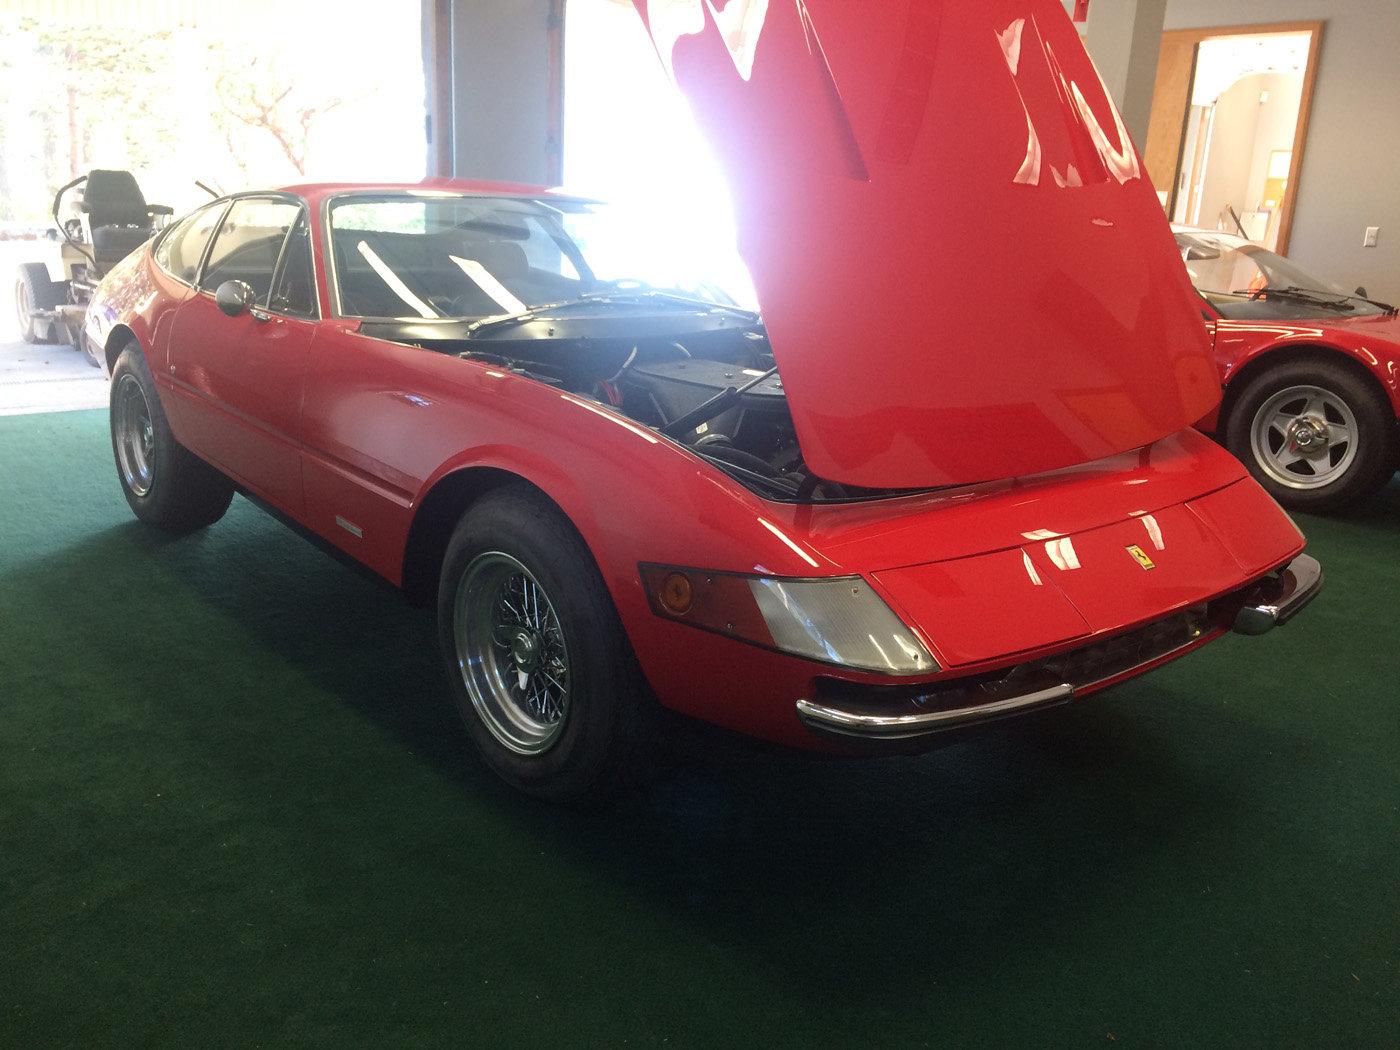 1970 Ferrari 365 GTB/4 Daytona For Sale (picture 2 of 6)